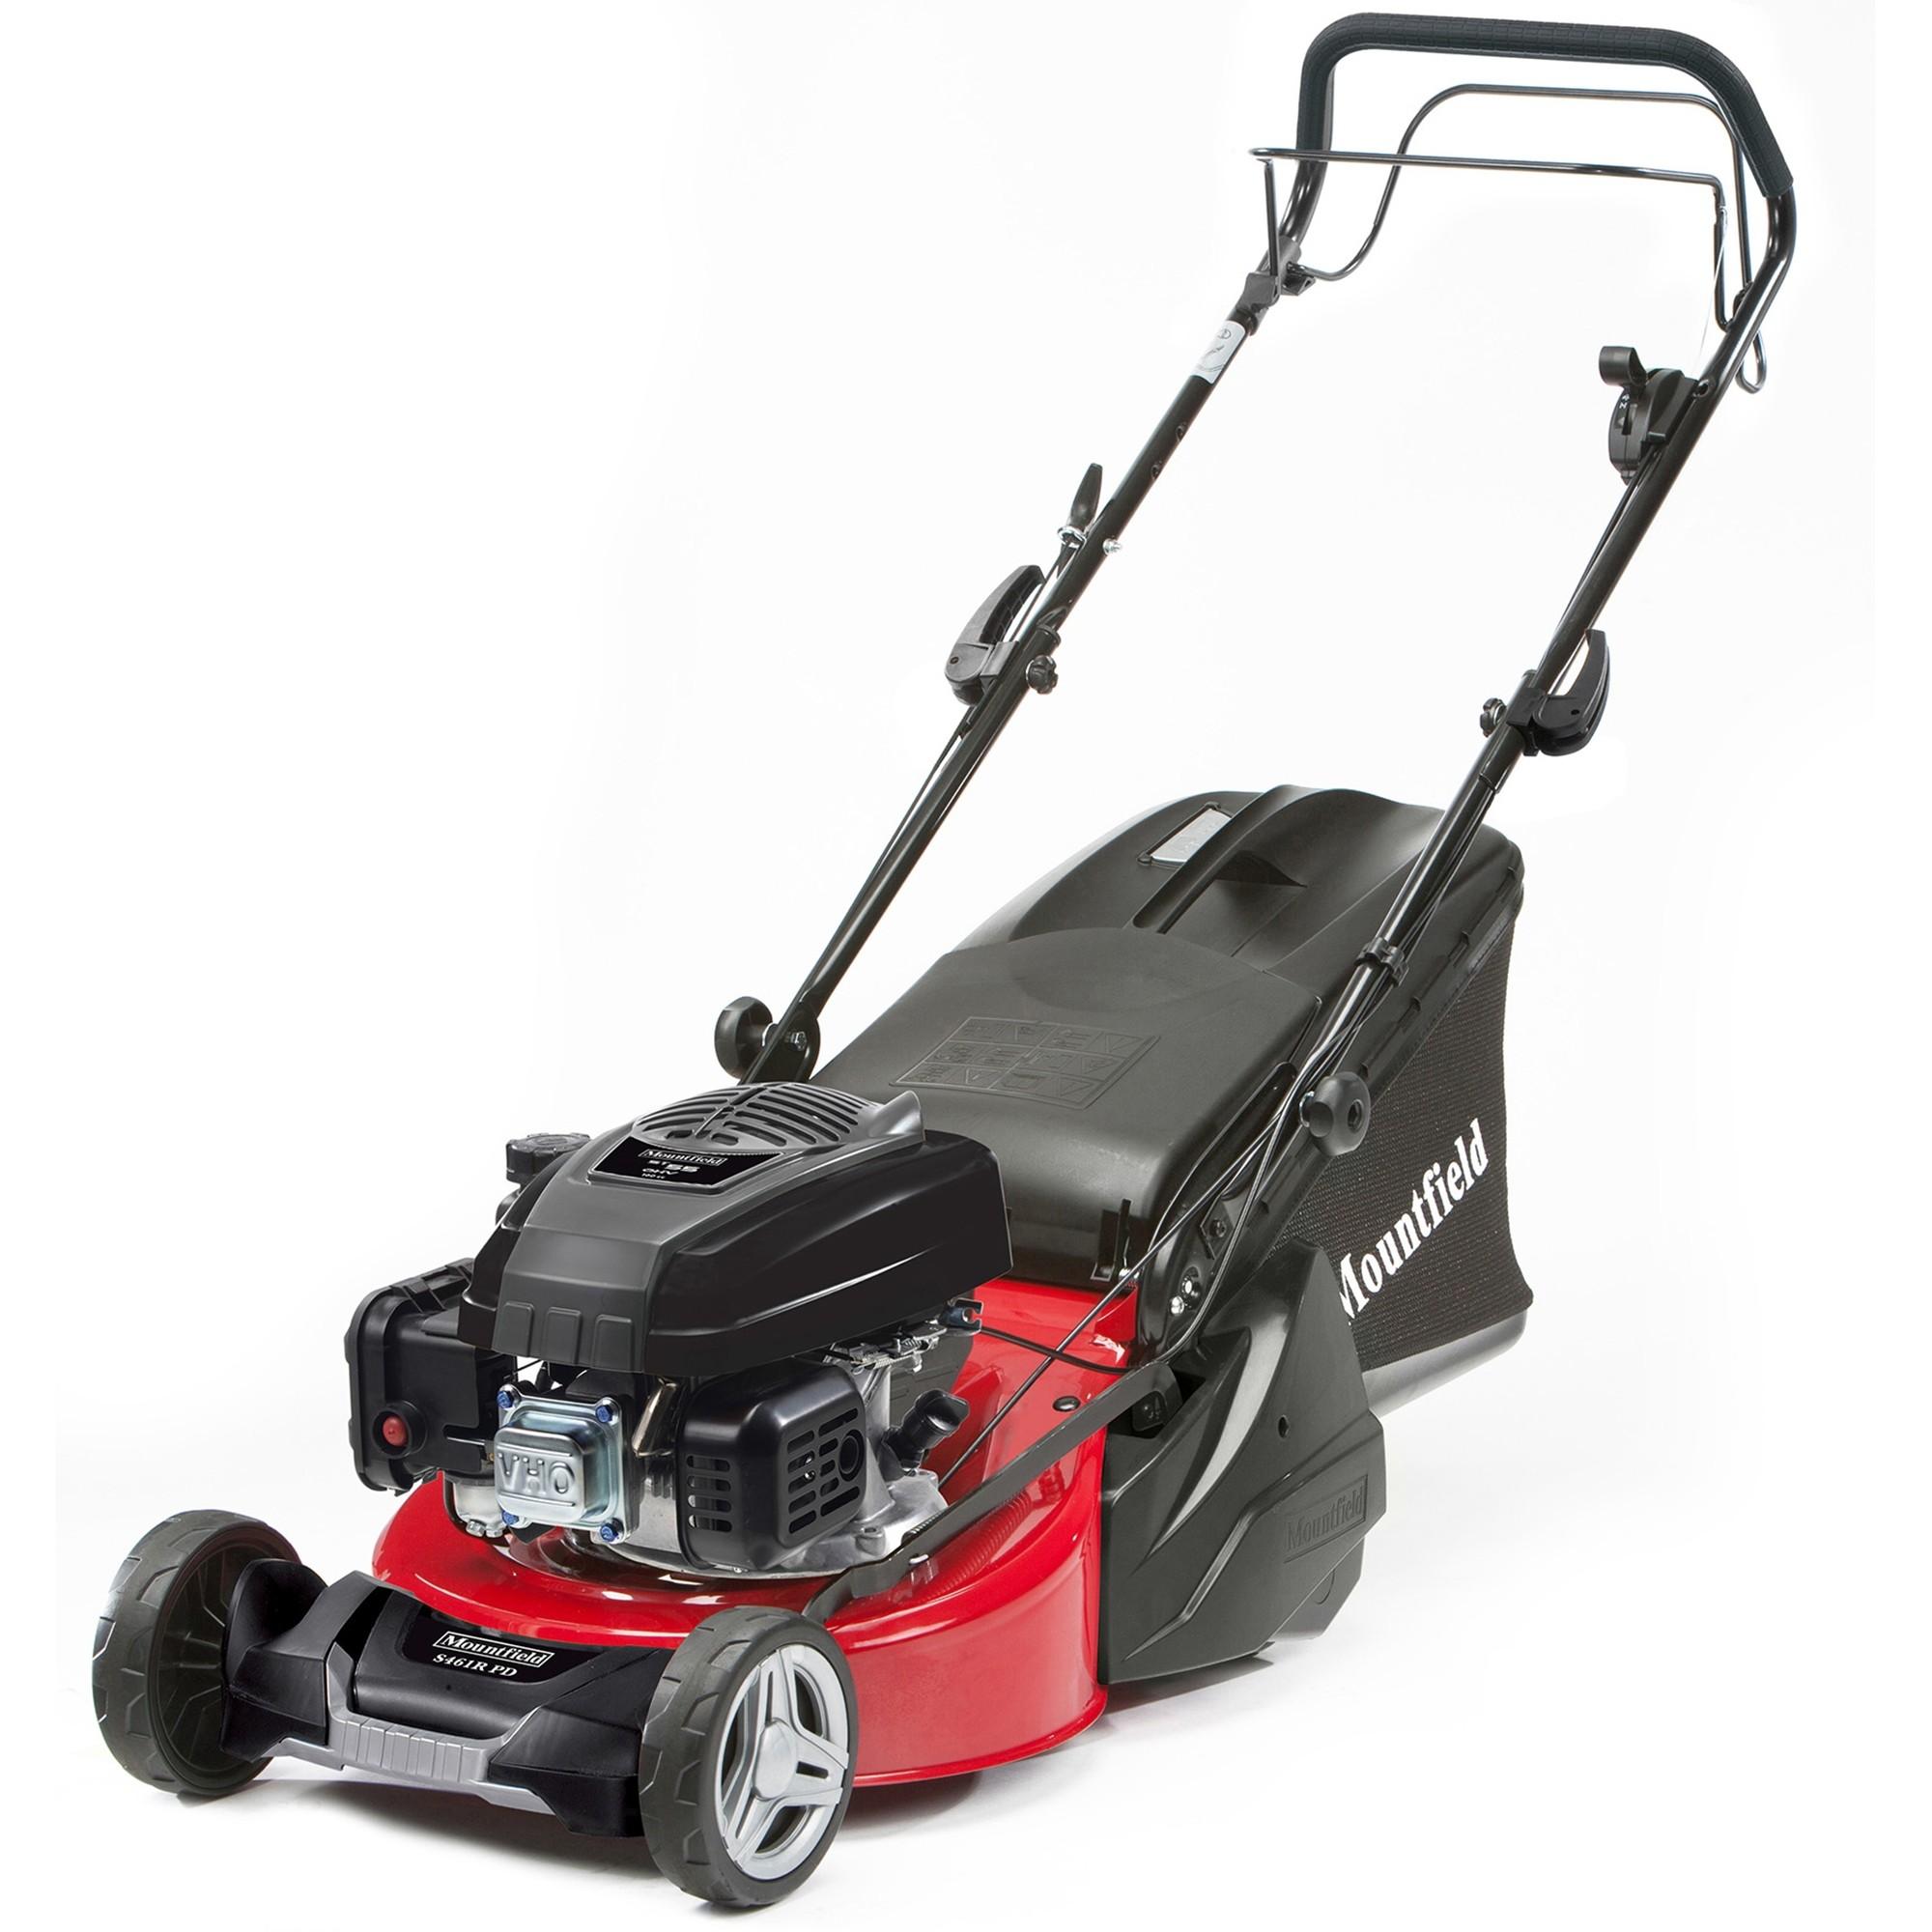 s461r-pd lawnmower